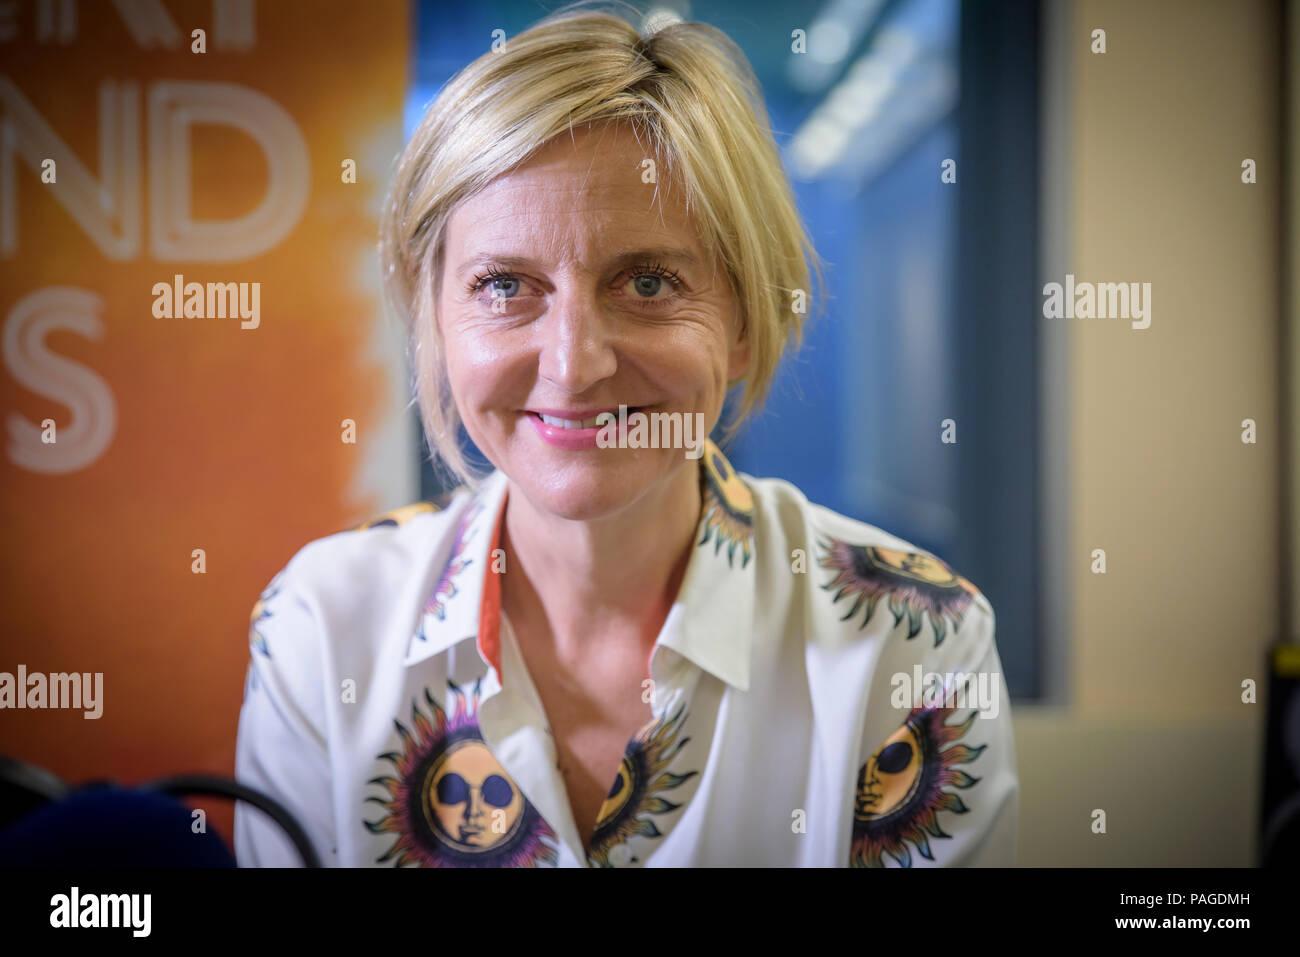 Marianne Elliott 2018 - Stock Image